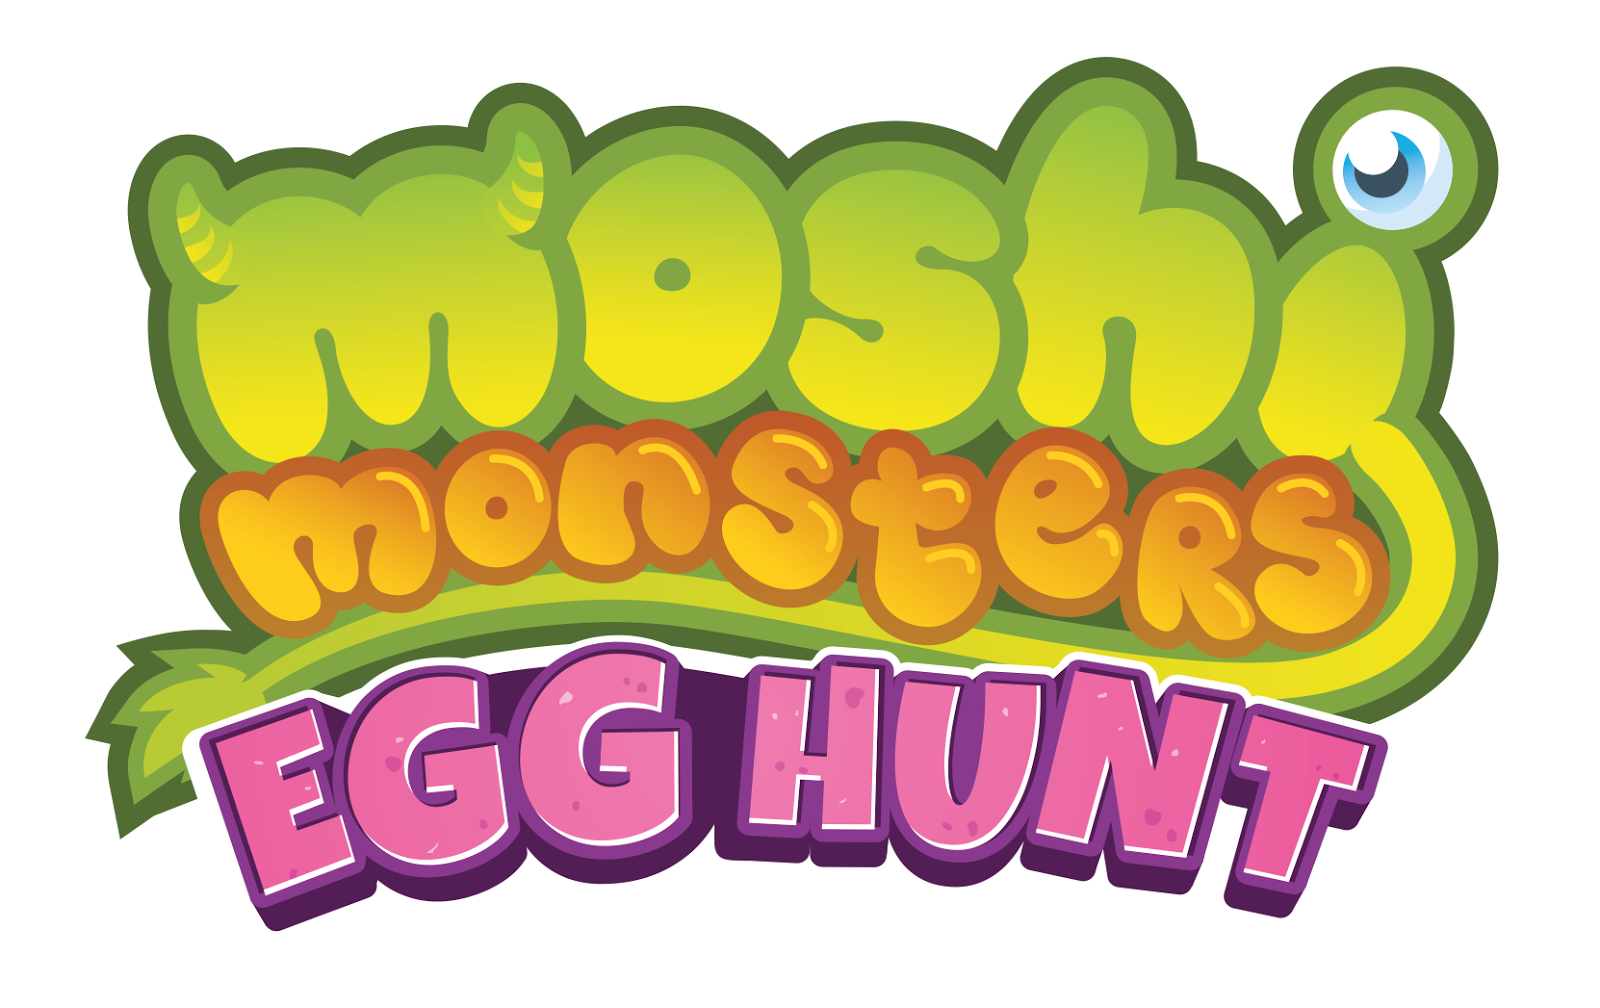 Moshi monsters egg hunt mobile game trading card review moshimonstersmadness